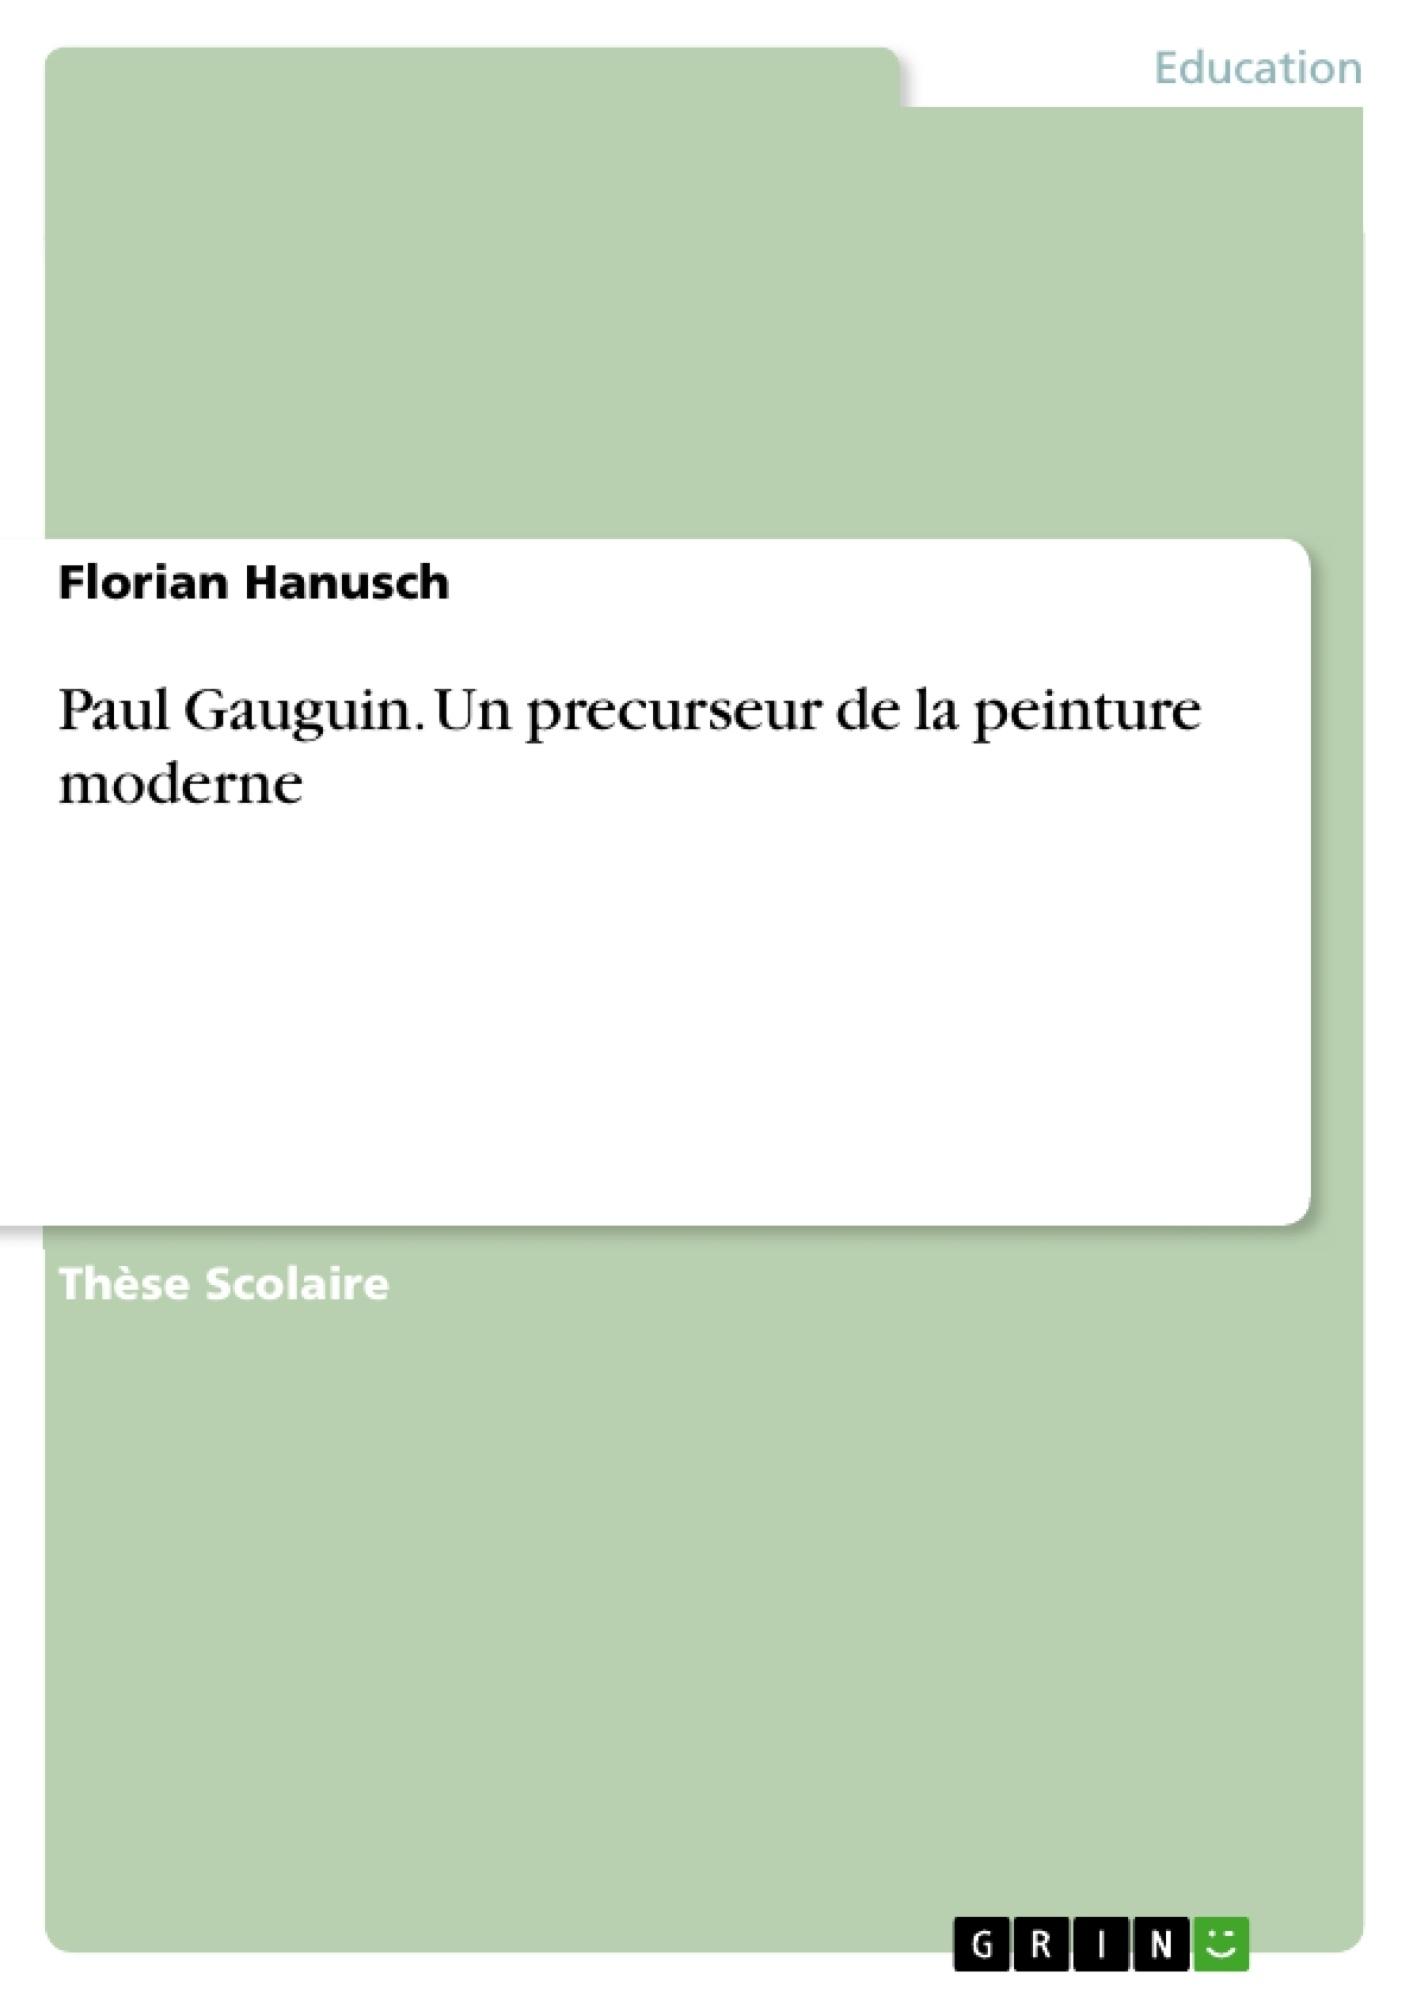 Titre: Paul Gauguin. Un precurseur de la peinture moderne